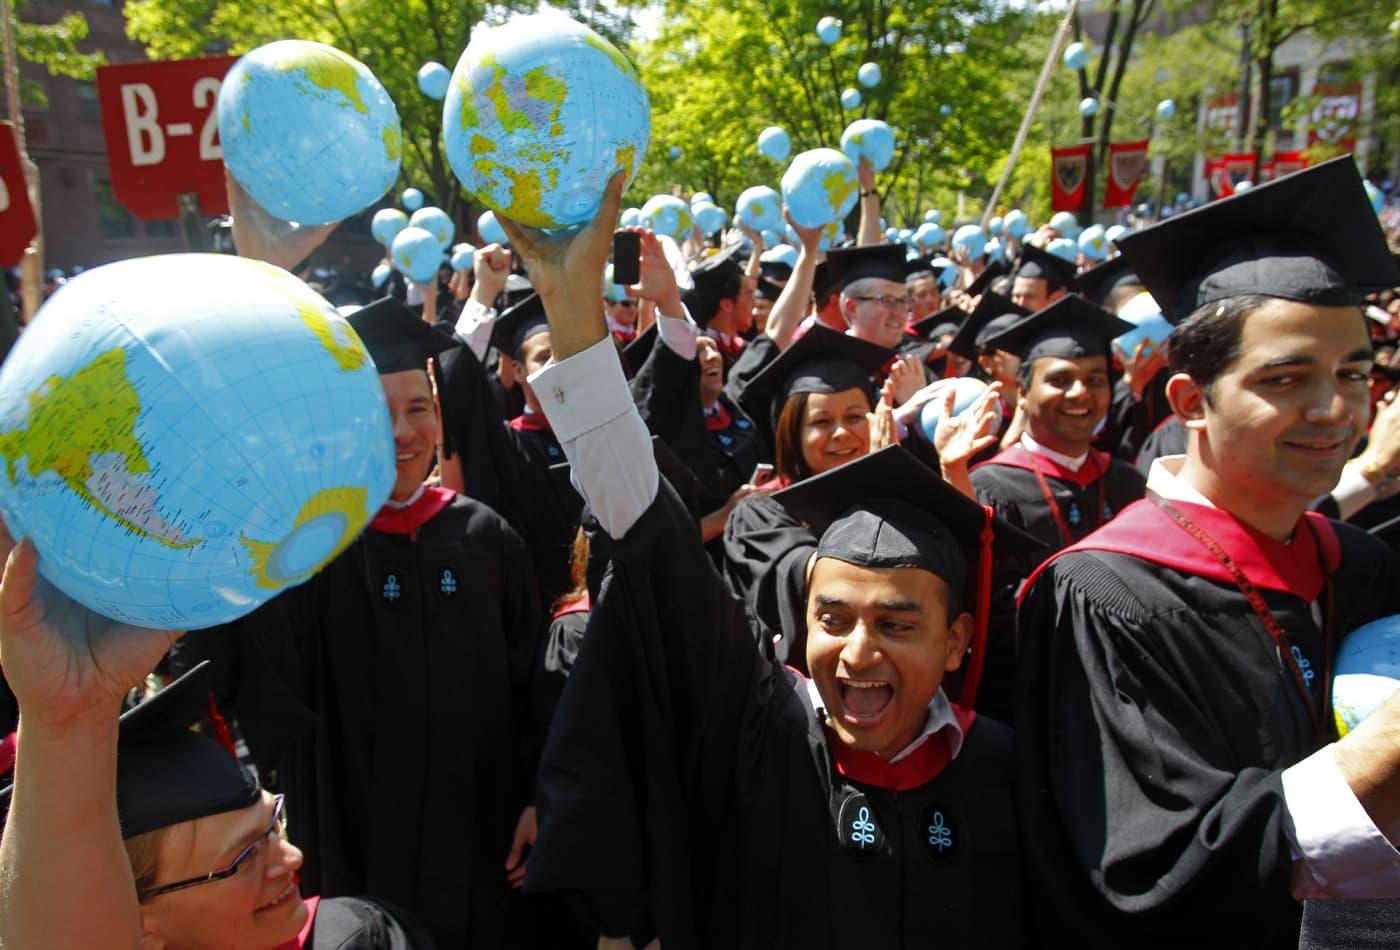 University Of Washington Graduation 2020.10 Best Universities In The World According To Us News Ranking